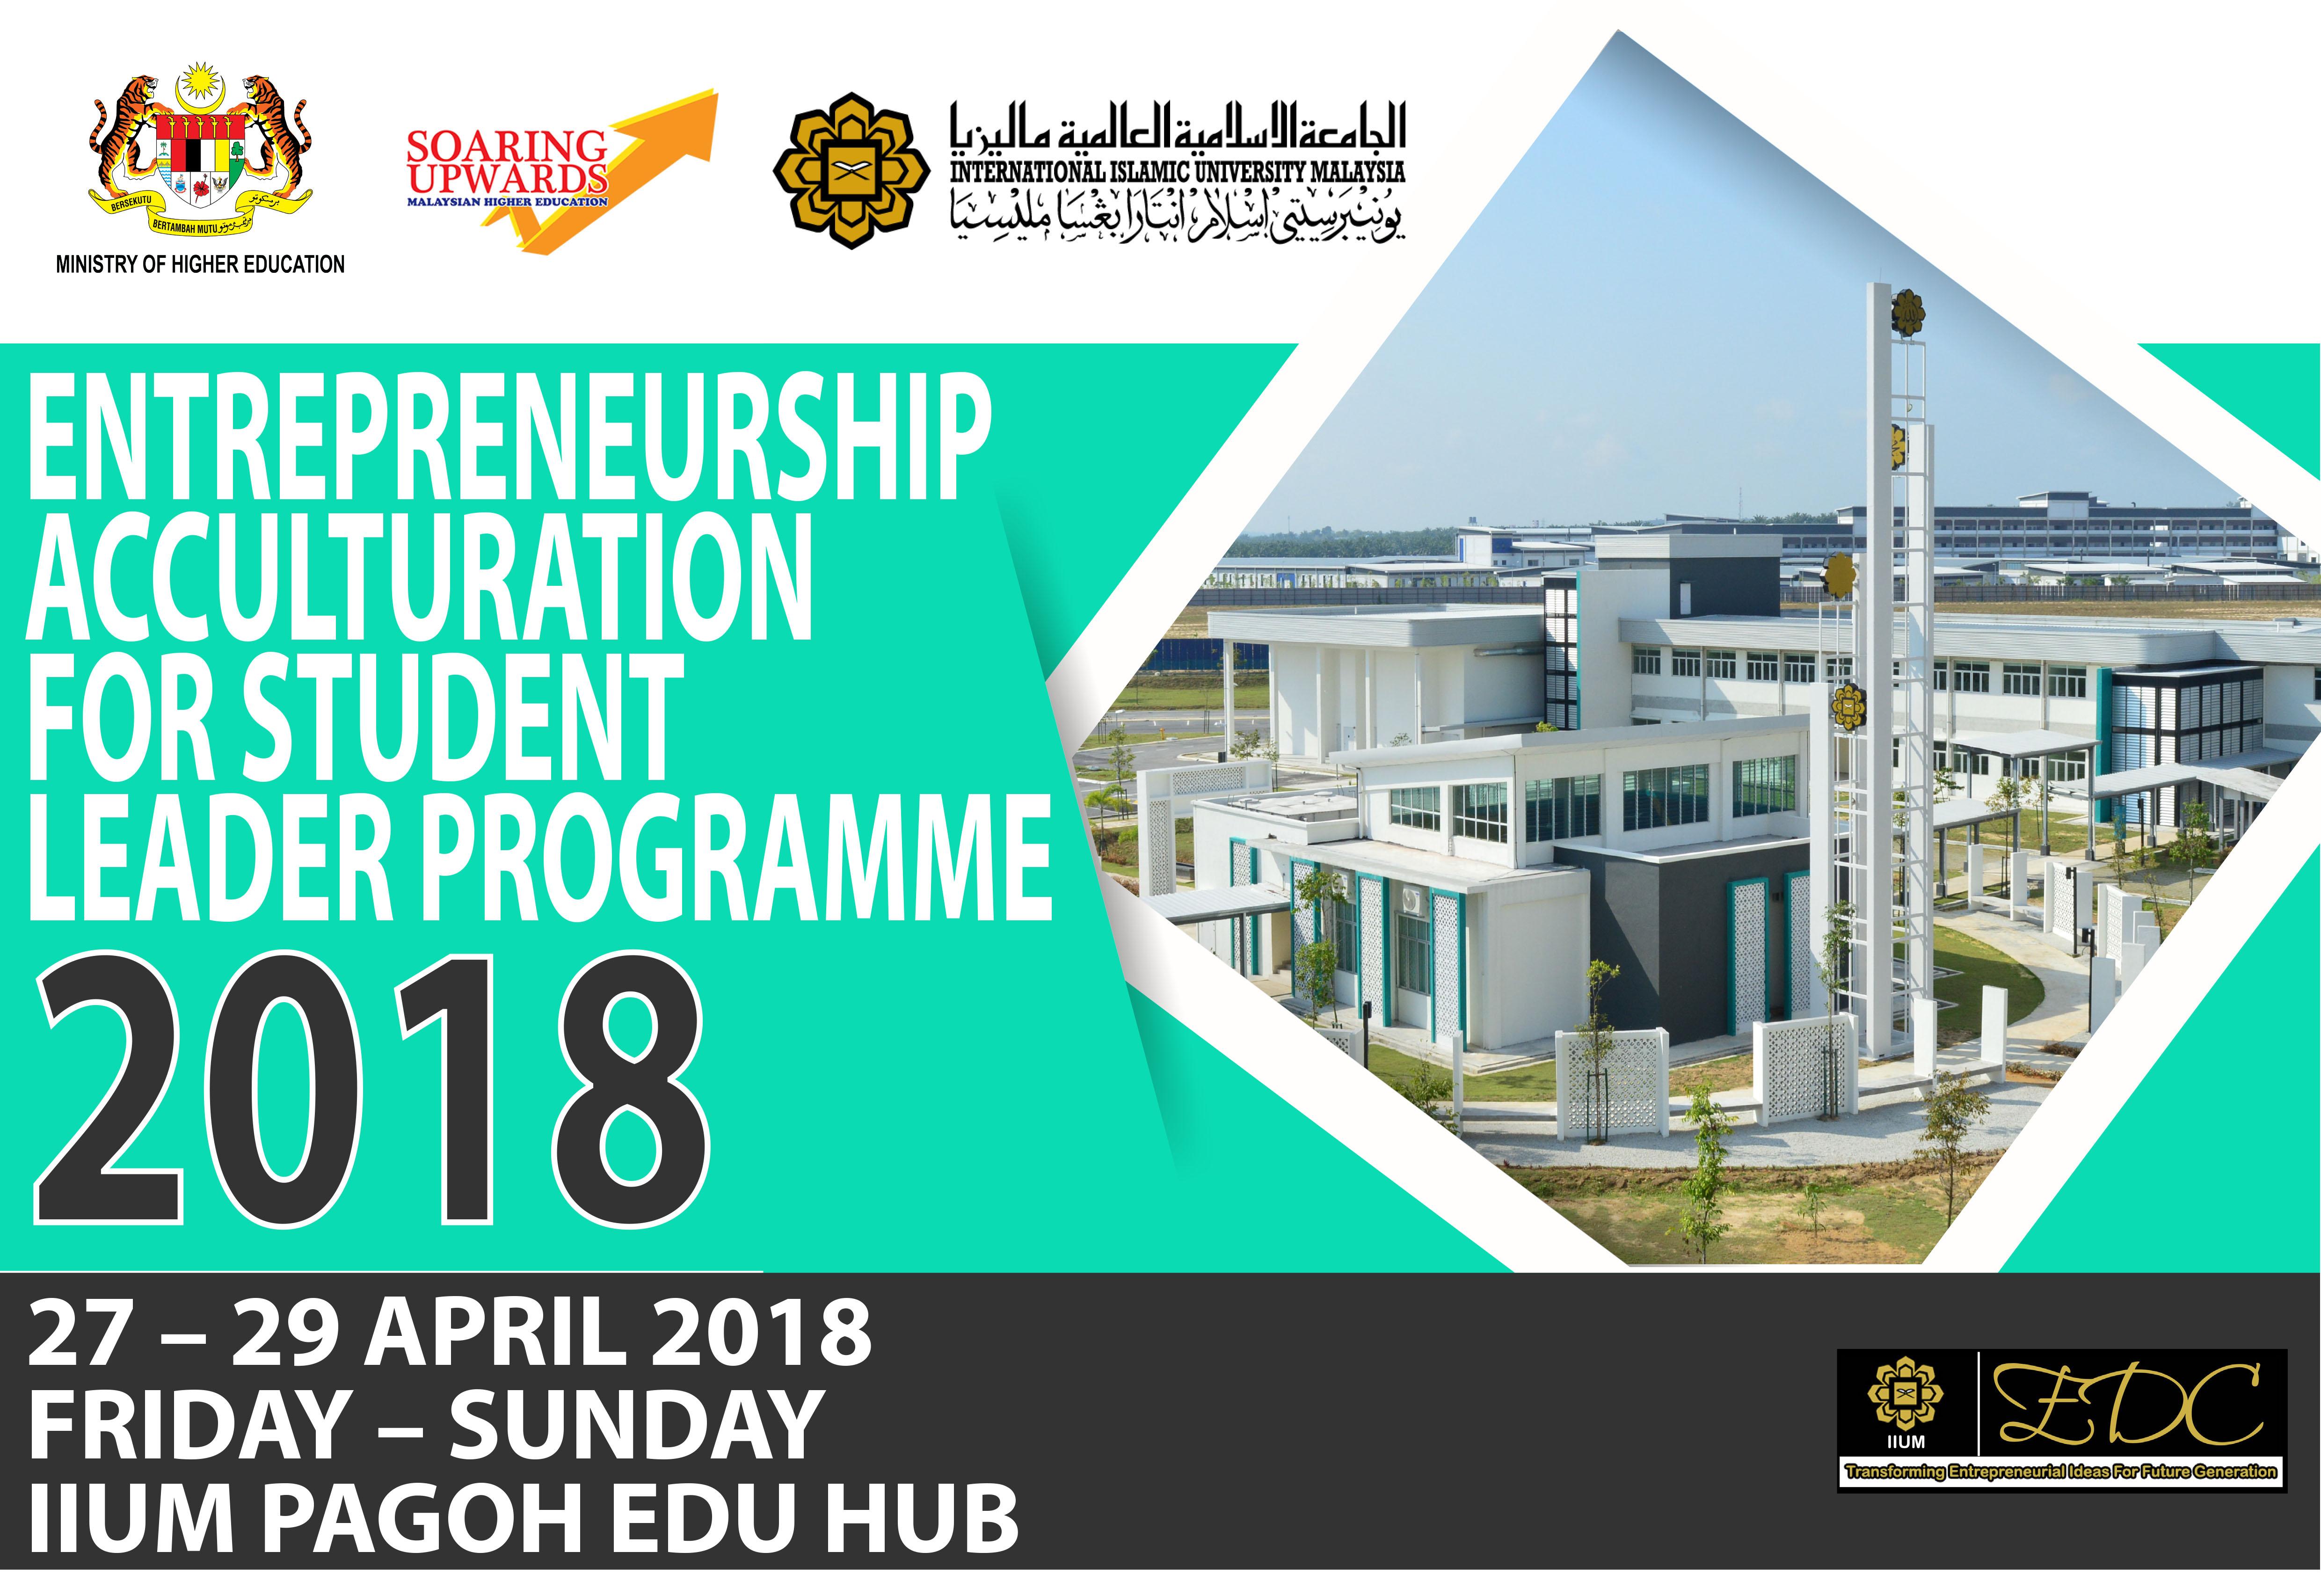 Entrepreneurship Acculturation for Student Leader